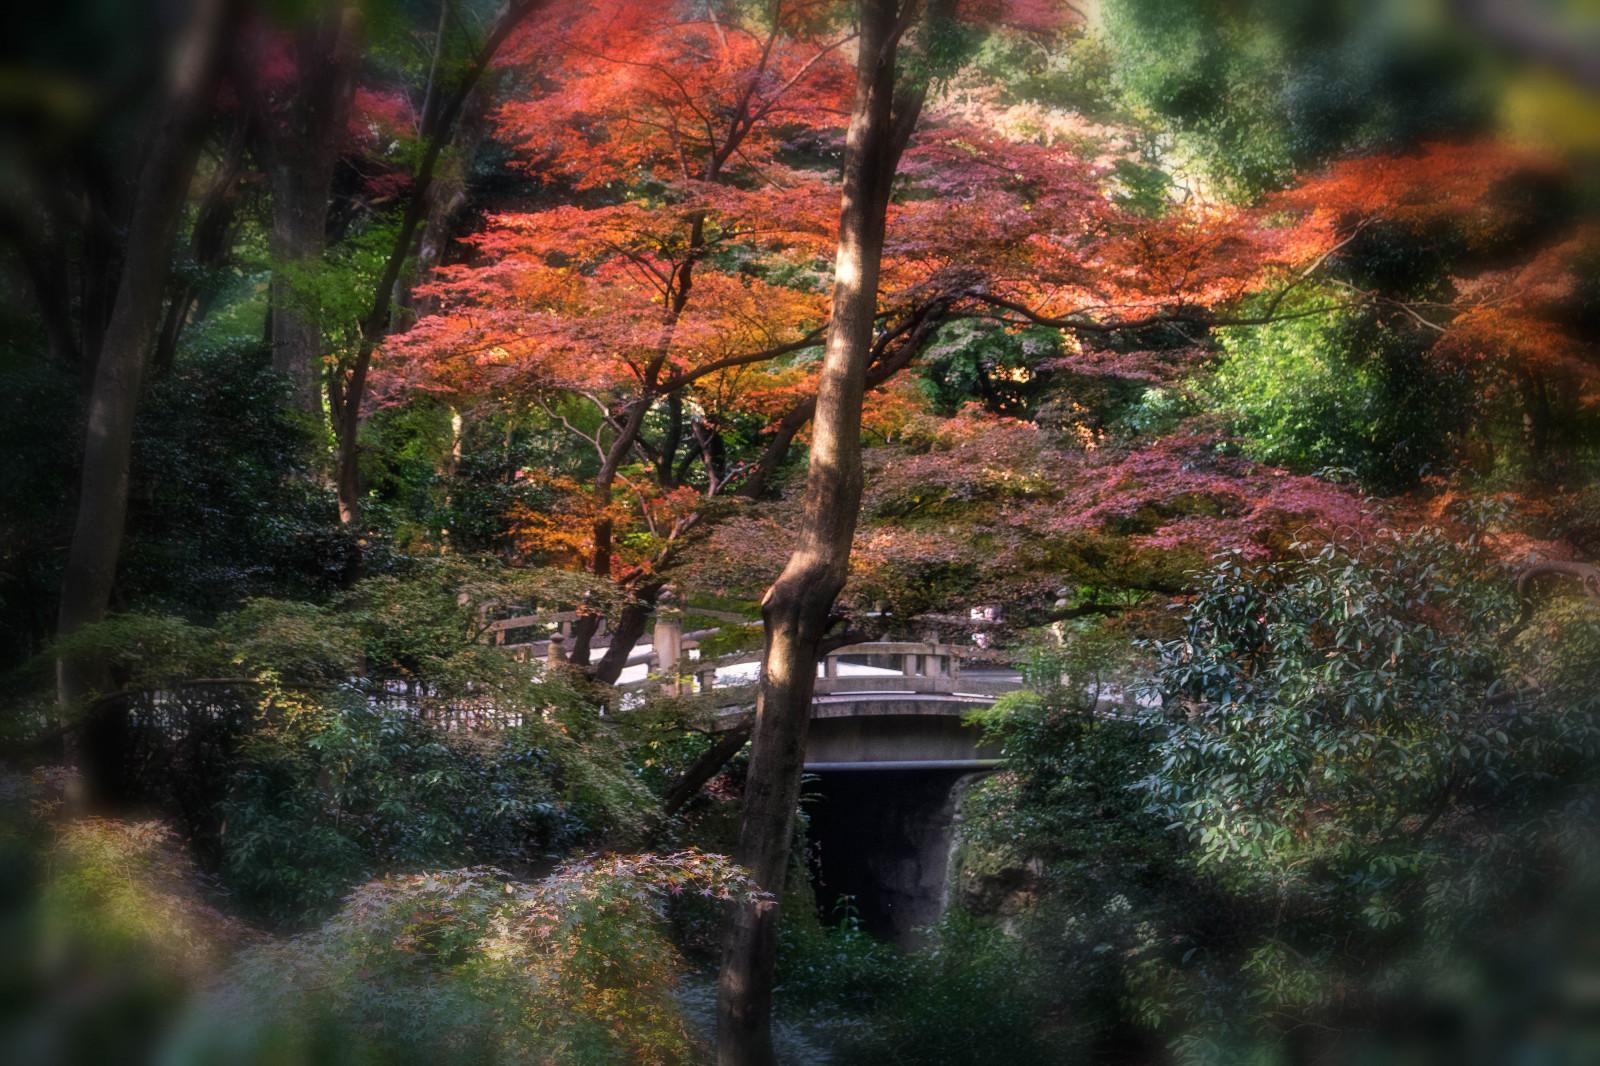 Fondos de pantalla jap n luz de sol paisaje bosque for Arboles jardin japones